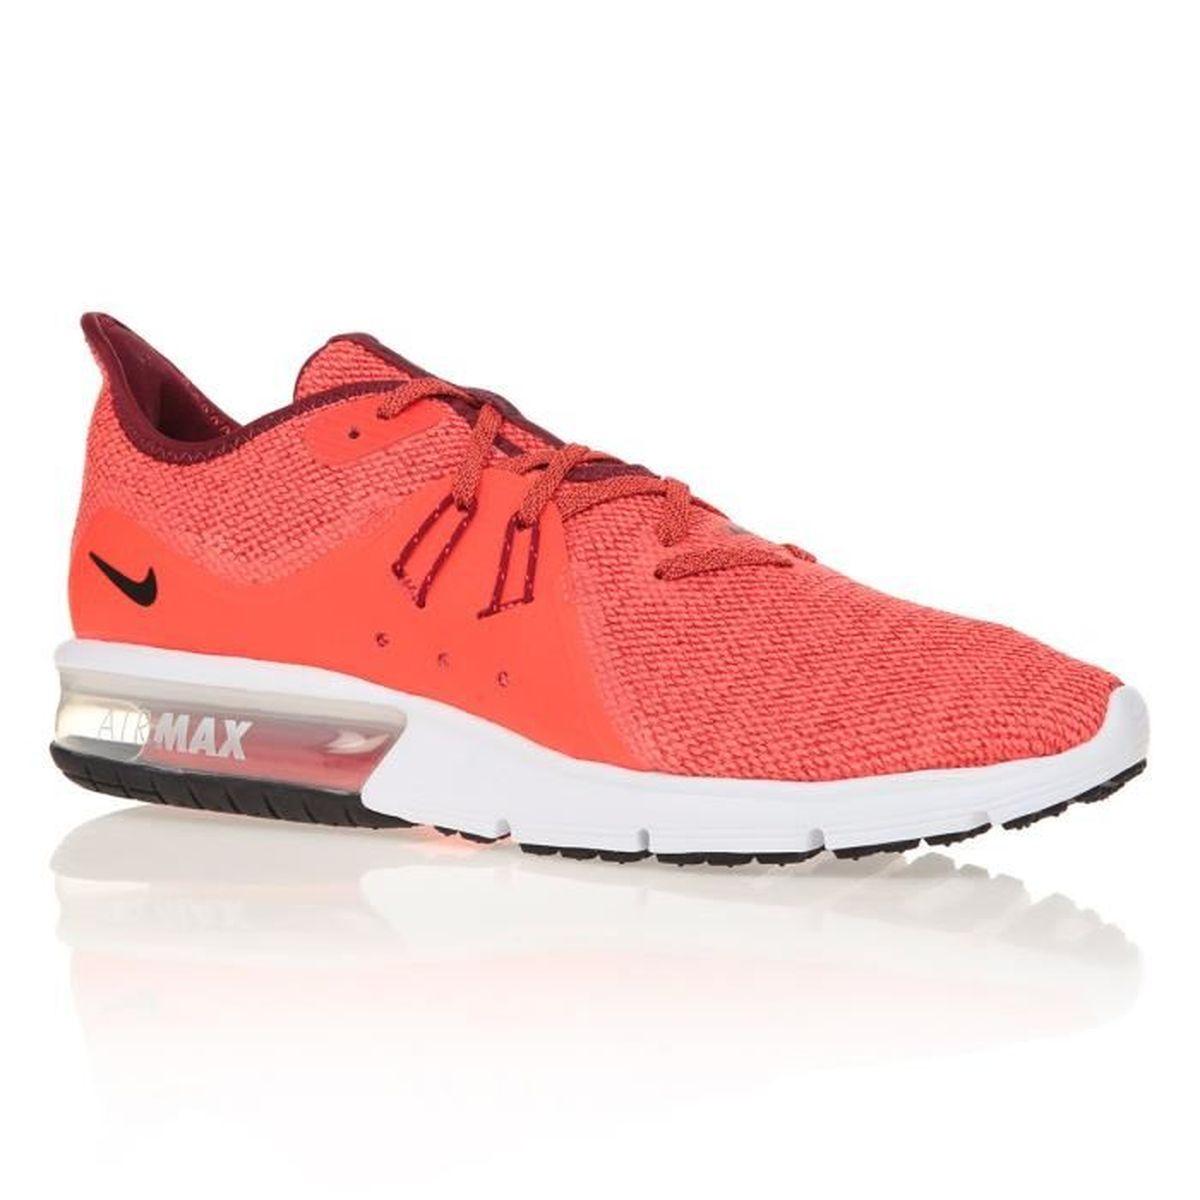 eec4fb05699ed Nike chaussure homme orange - Achat   Vente pas cher